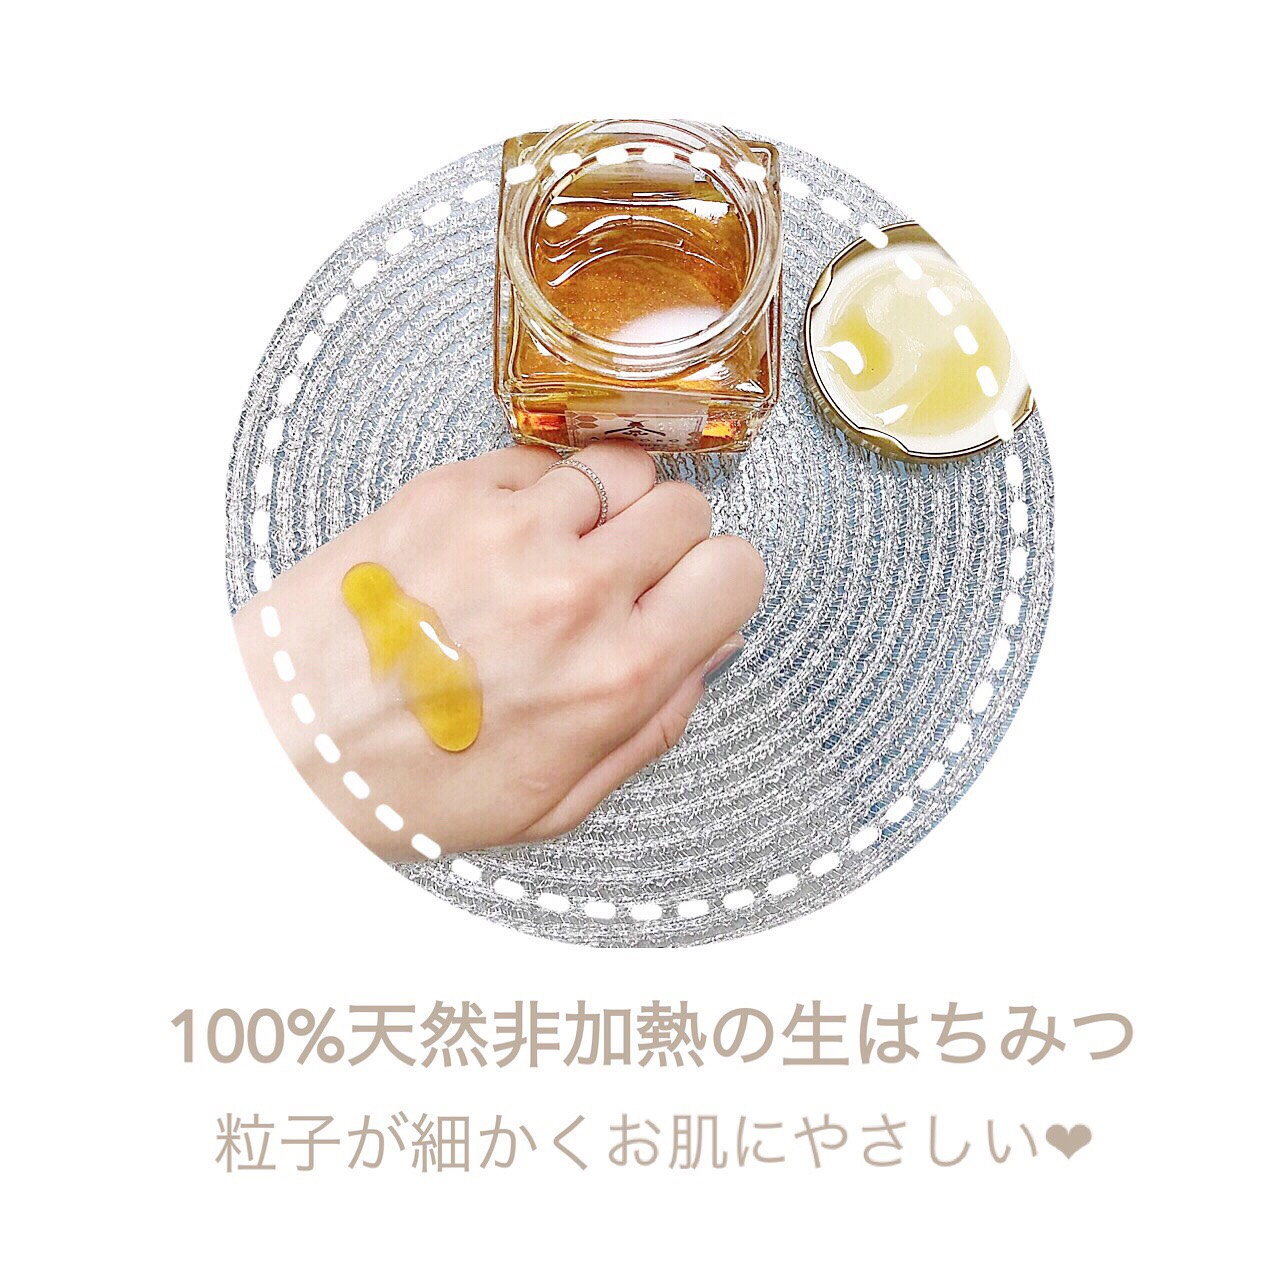 ★APIKOKO★ 粒子が細かくお肌に優しい♪100%天然非加熱の生はちみつ☆